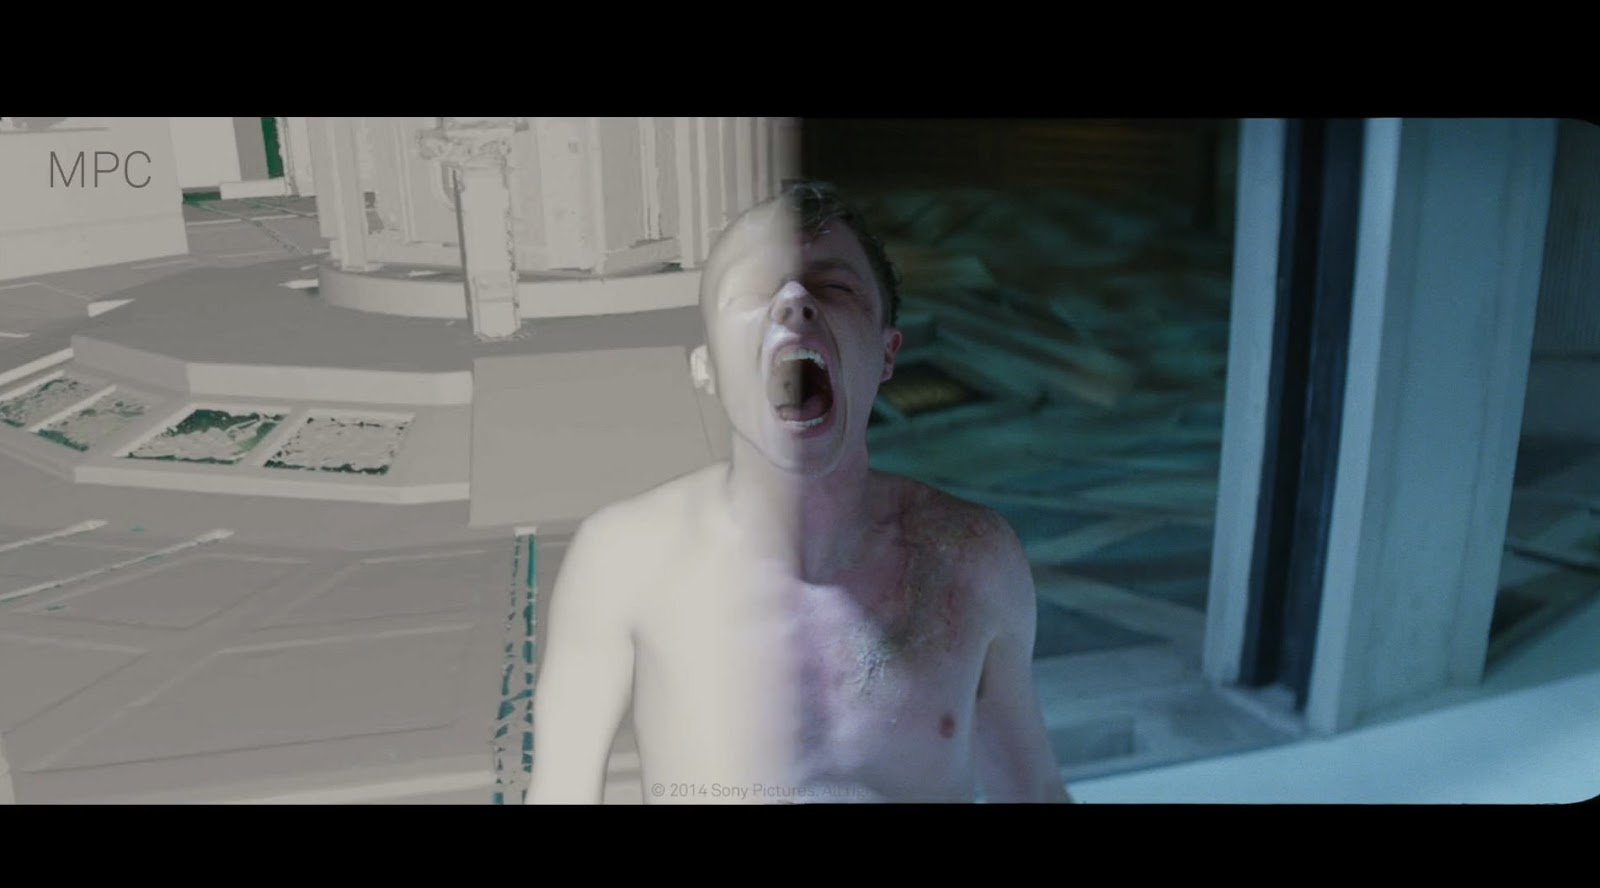 MPC The Amazing Spider Man 2 VFX breakdown 4